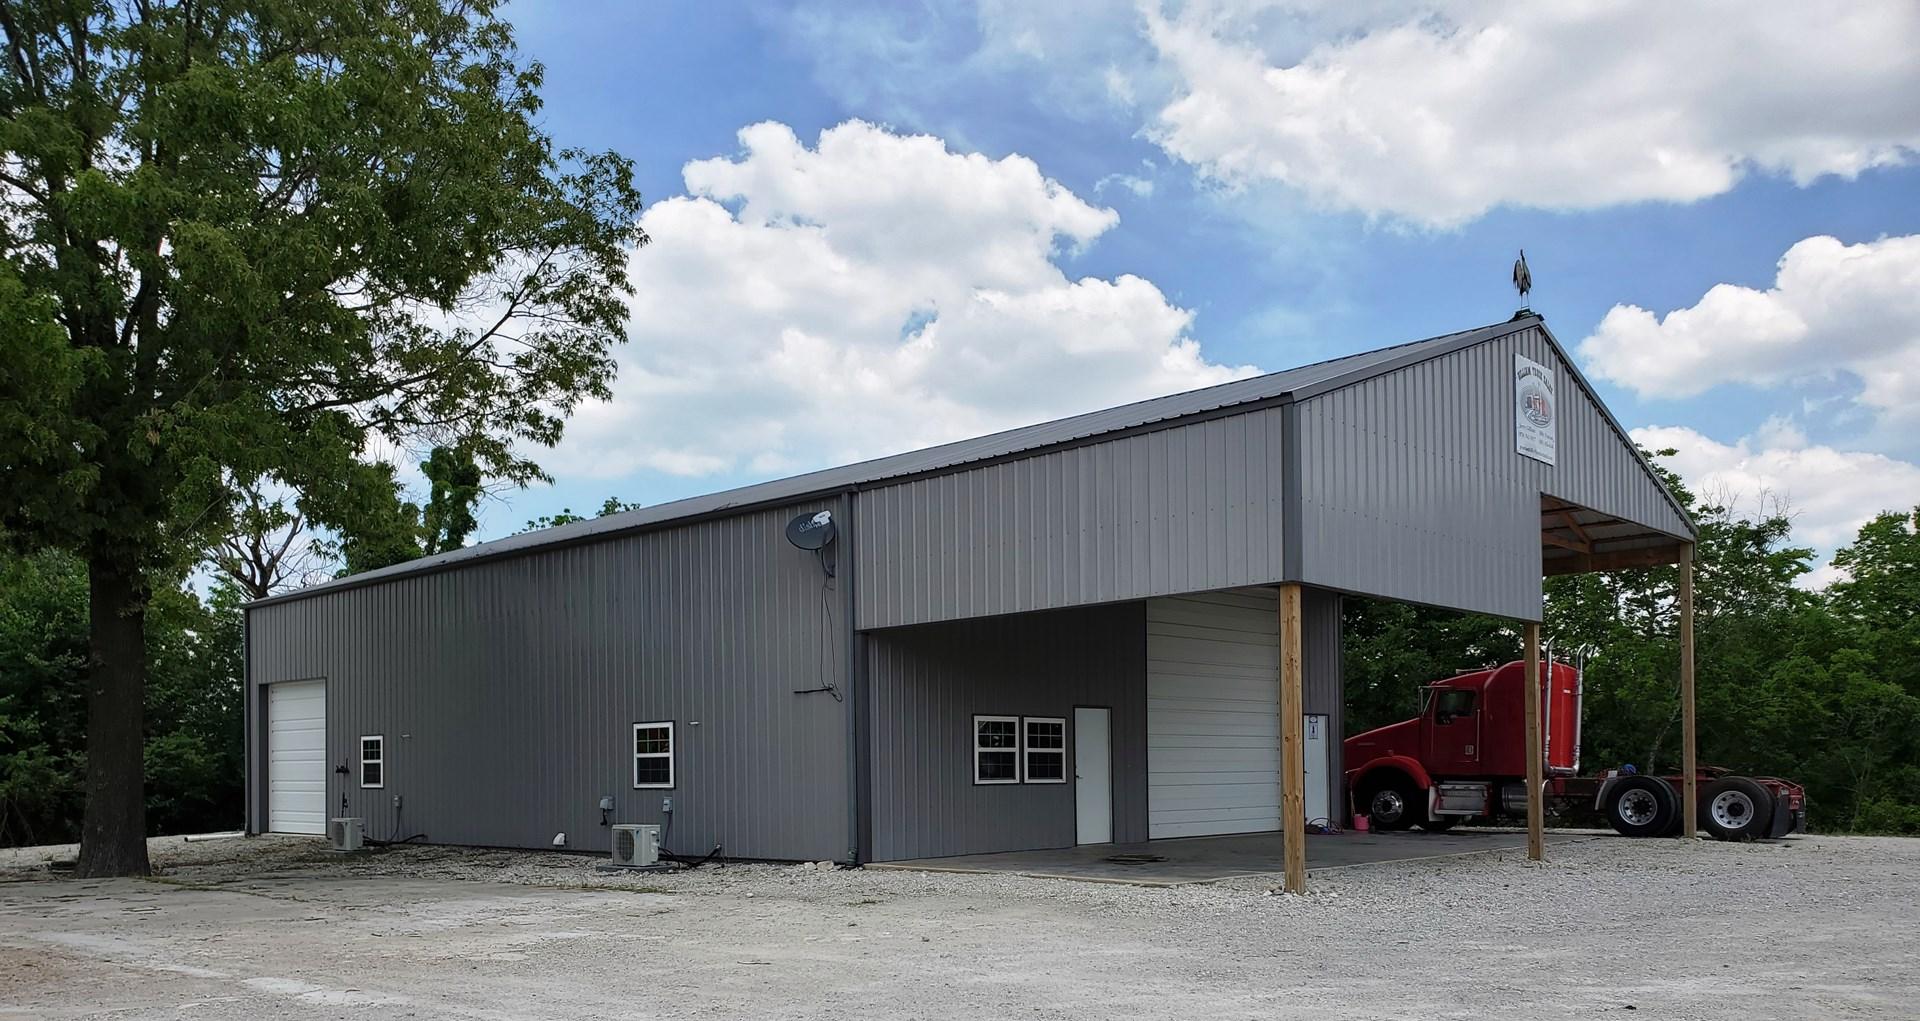 Barndominium For Sale in Arkansas